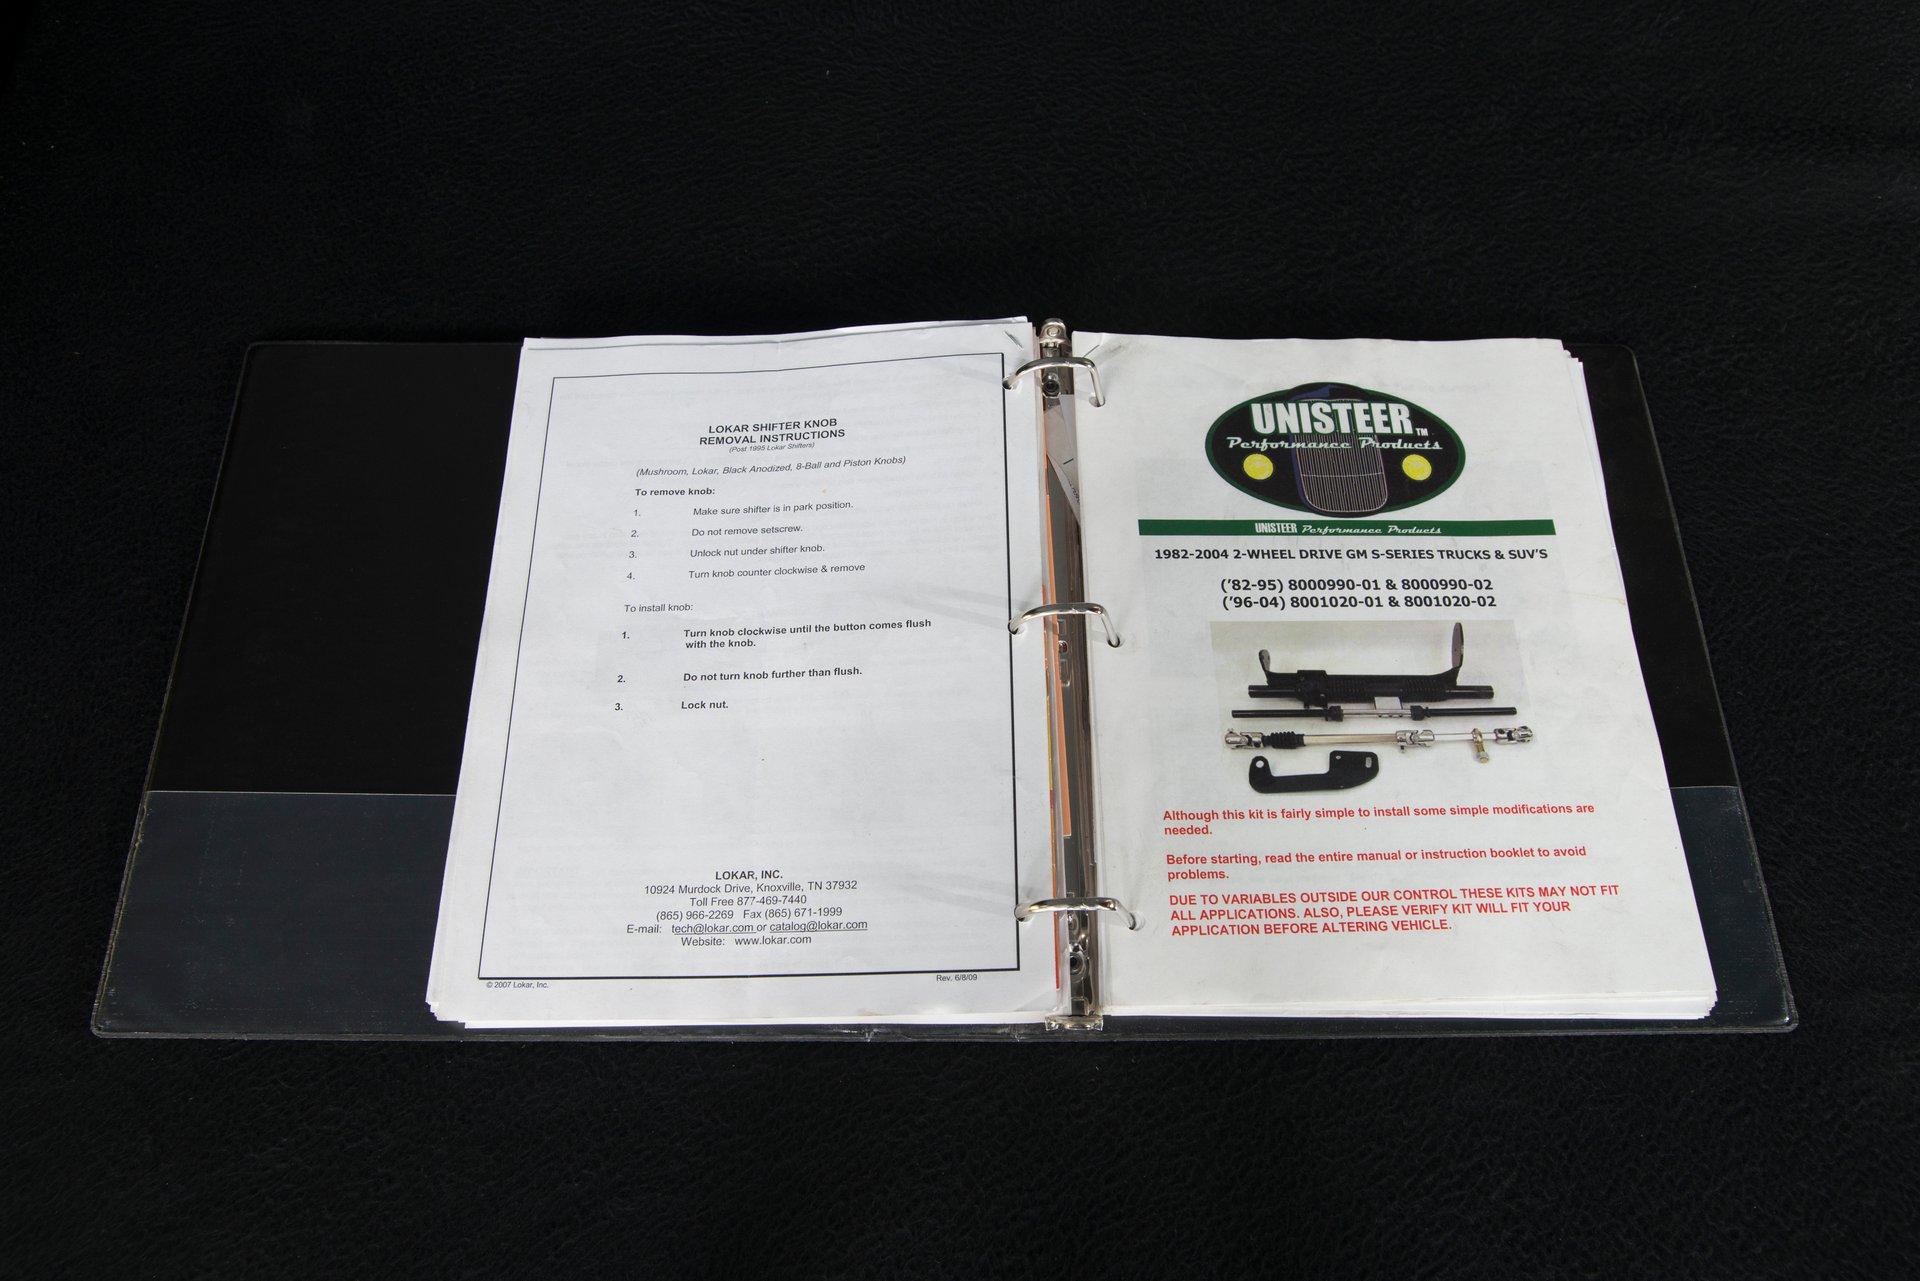 1959 Chevrolet 3100 Pickup Truck for sale #60166   MCG